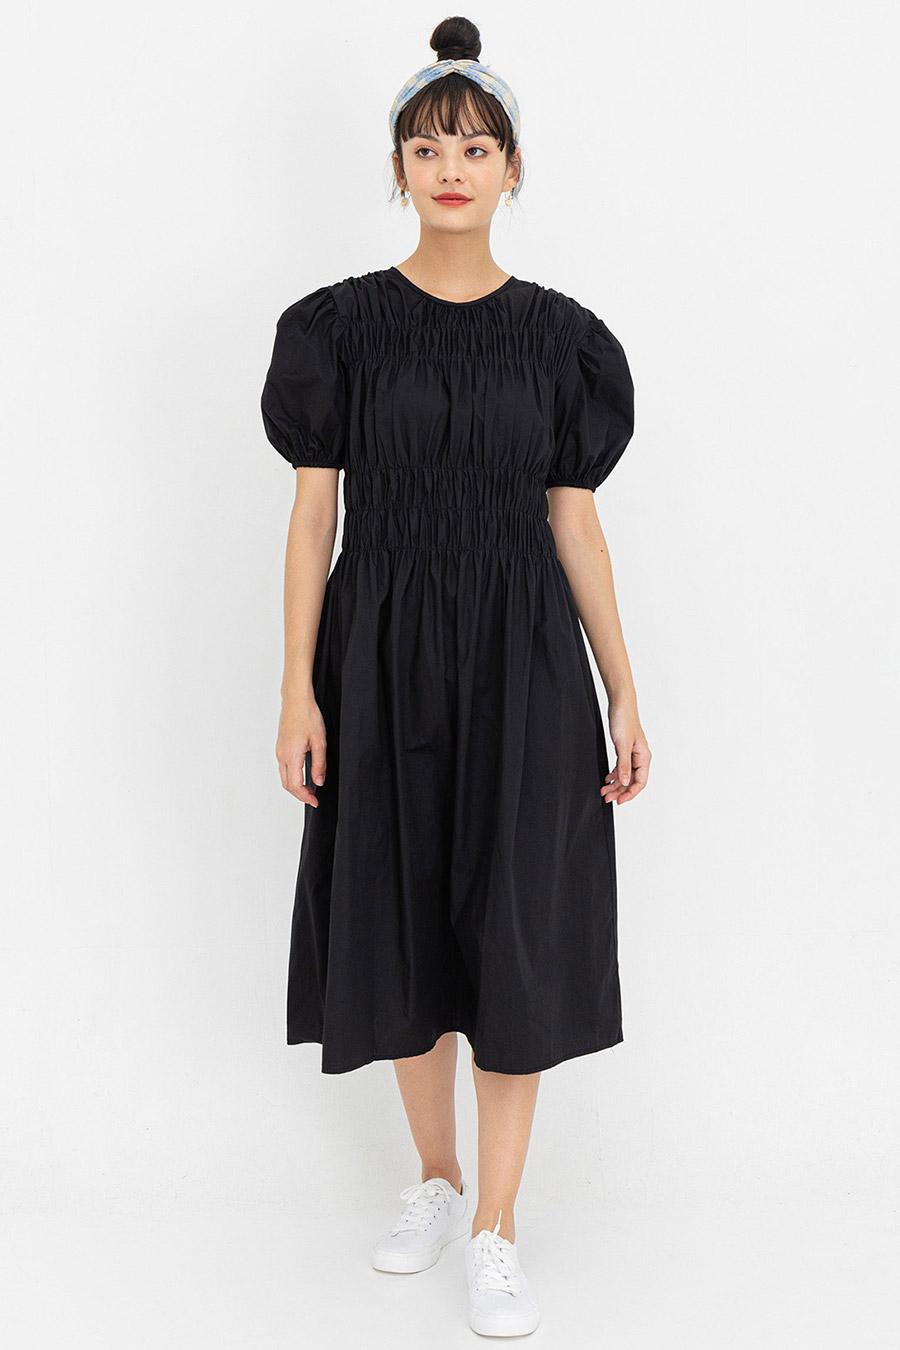 LILLIBETH DRESS - NOIR